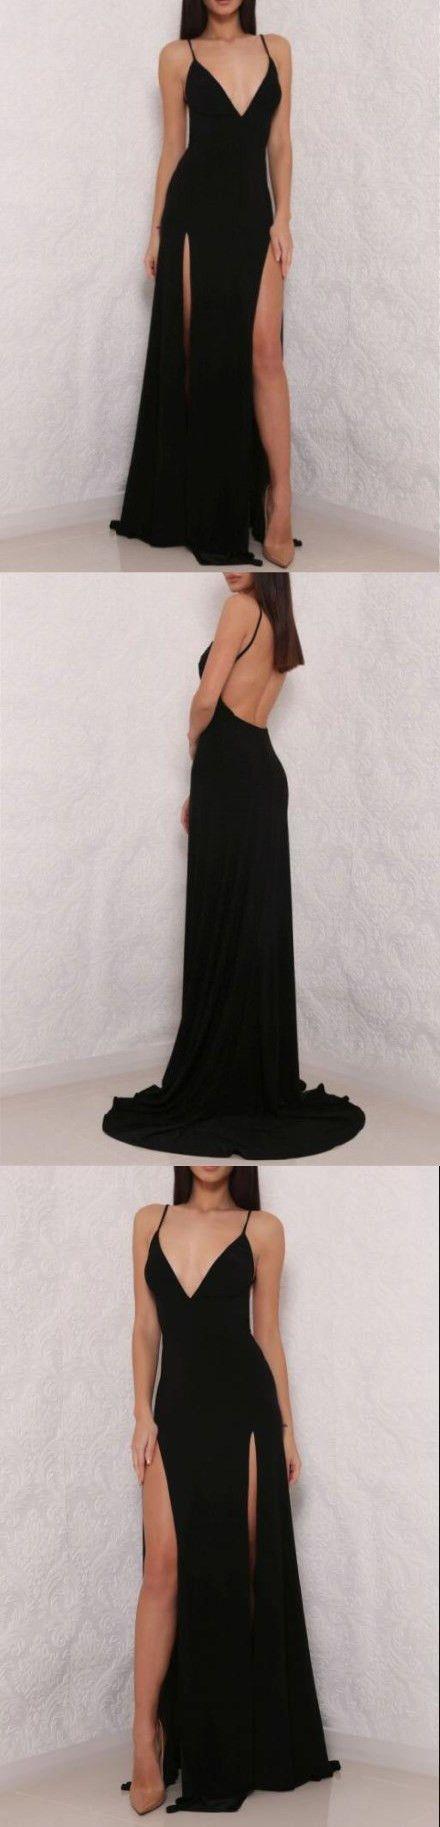 Sexy black spaghetti strap prom dressv neck prom dressopen back